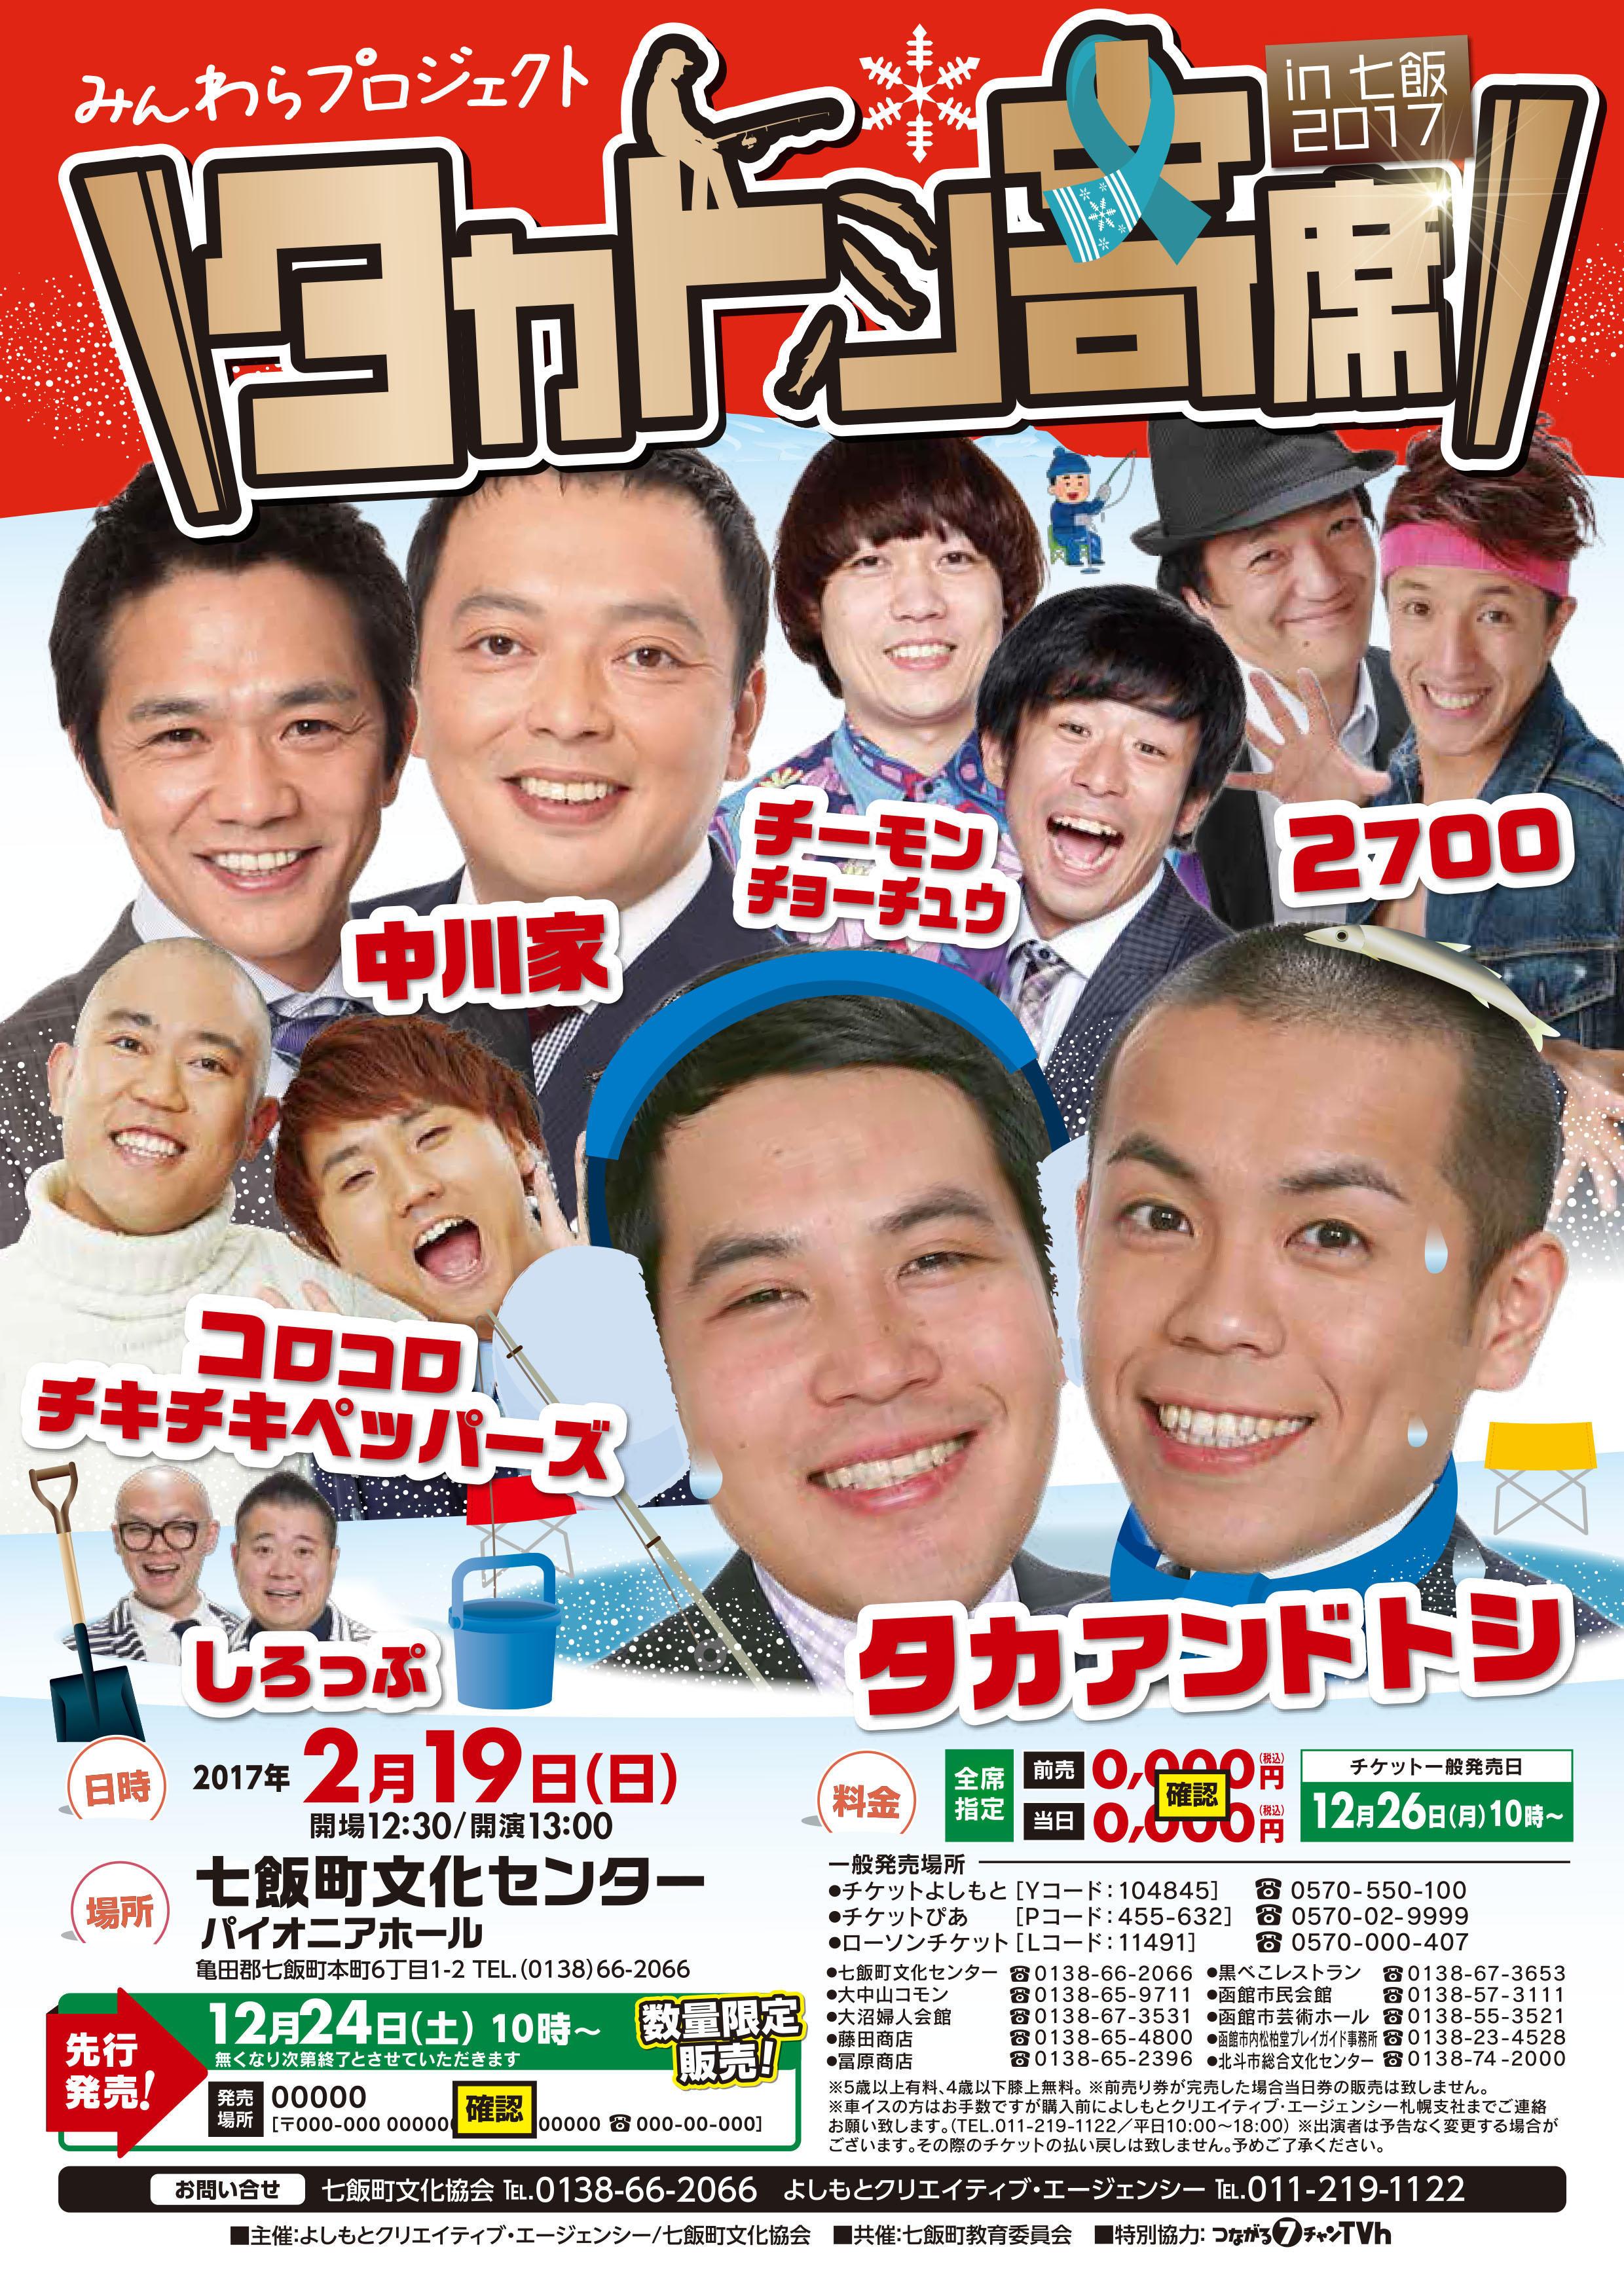 http://www.syumatsu.jp/20170106175100-d4689f7da7eb7b61319fff9b17a47f95648ae521.jpg